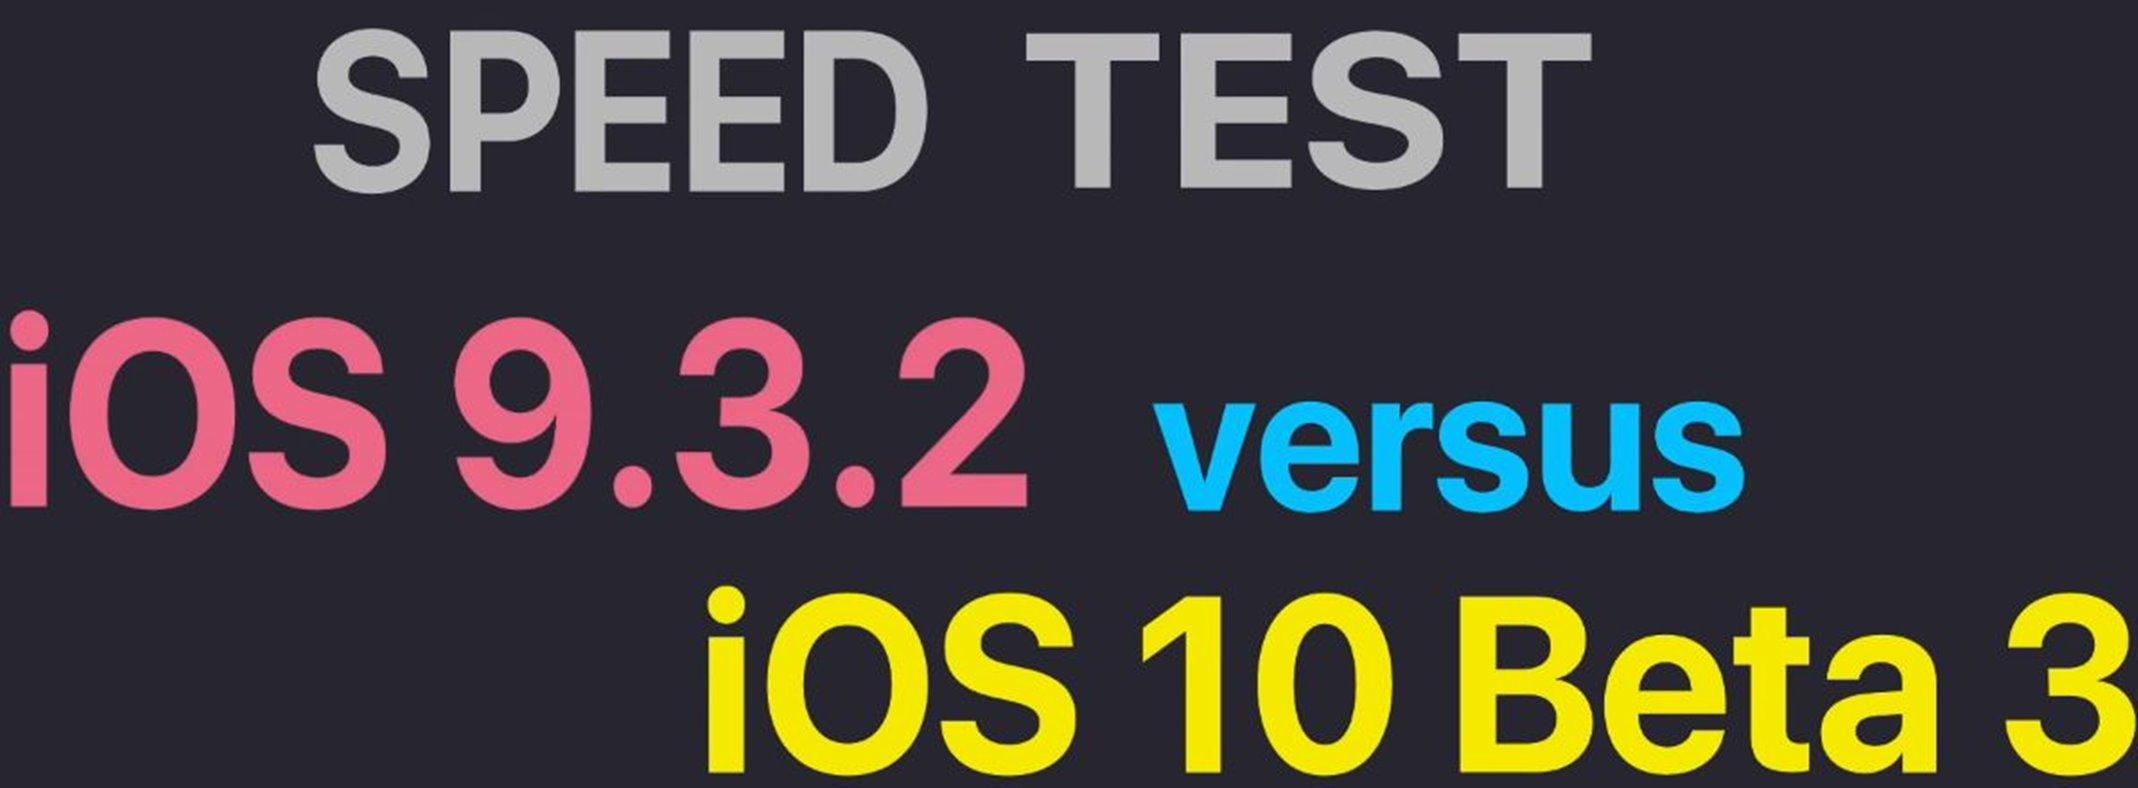 performante iOS 9.3.2 vs iOS 10 beta 3